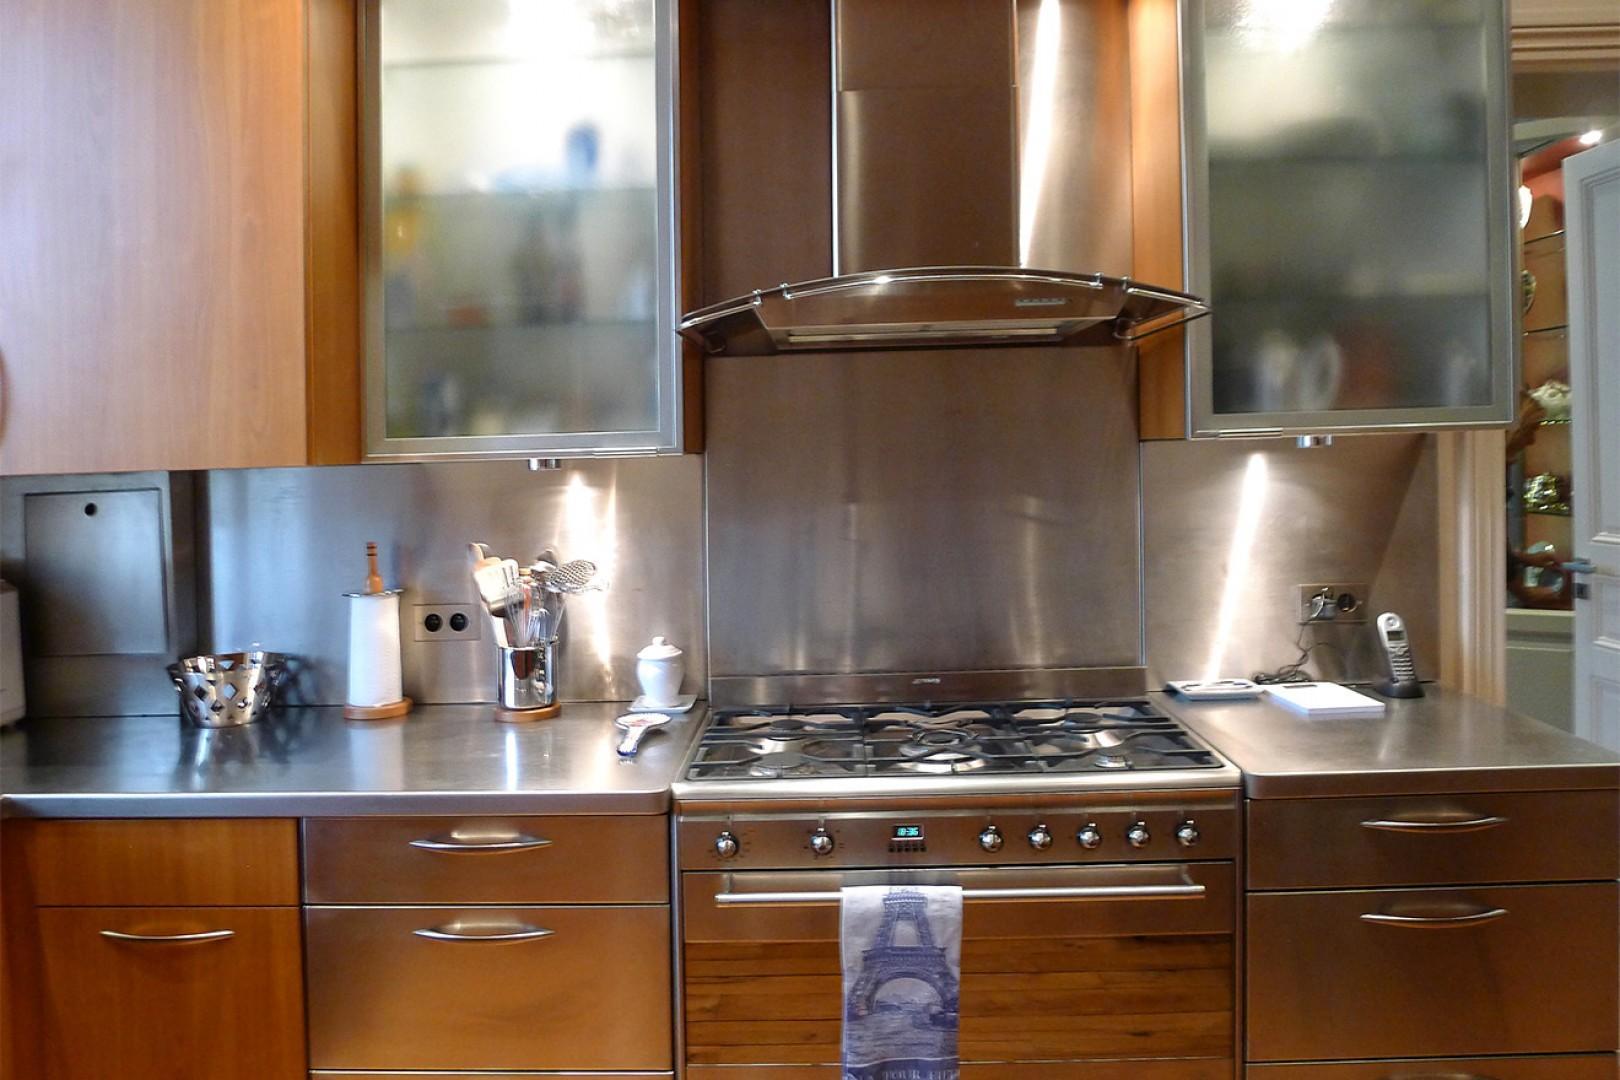 Enjoy cooking at home at this beautiful Paris rental!